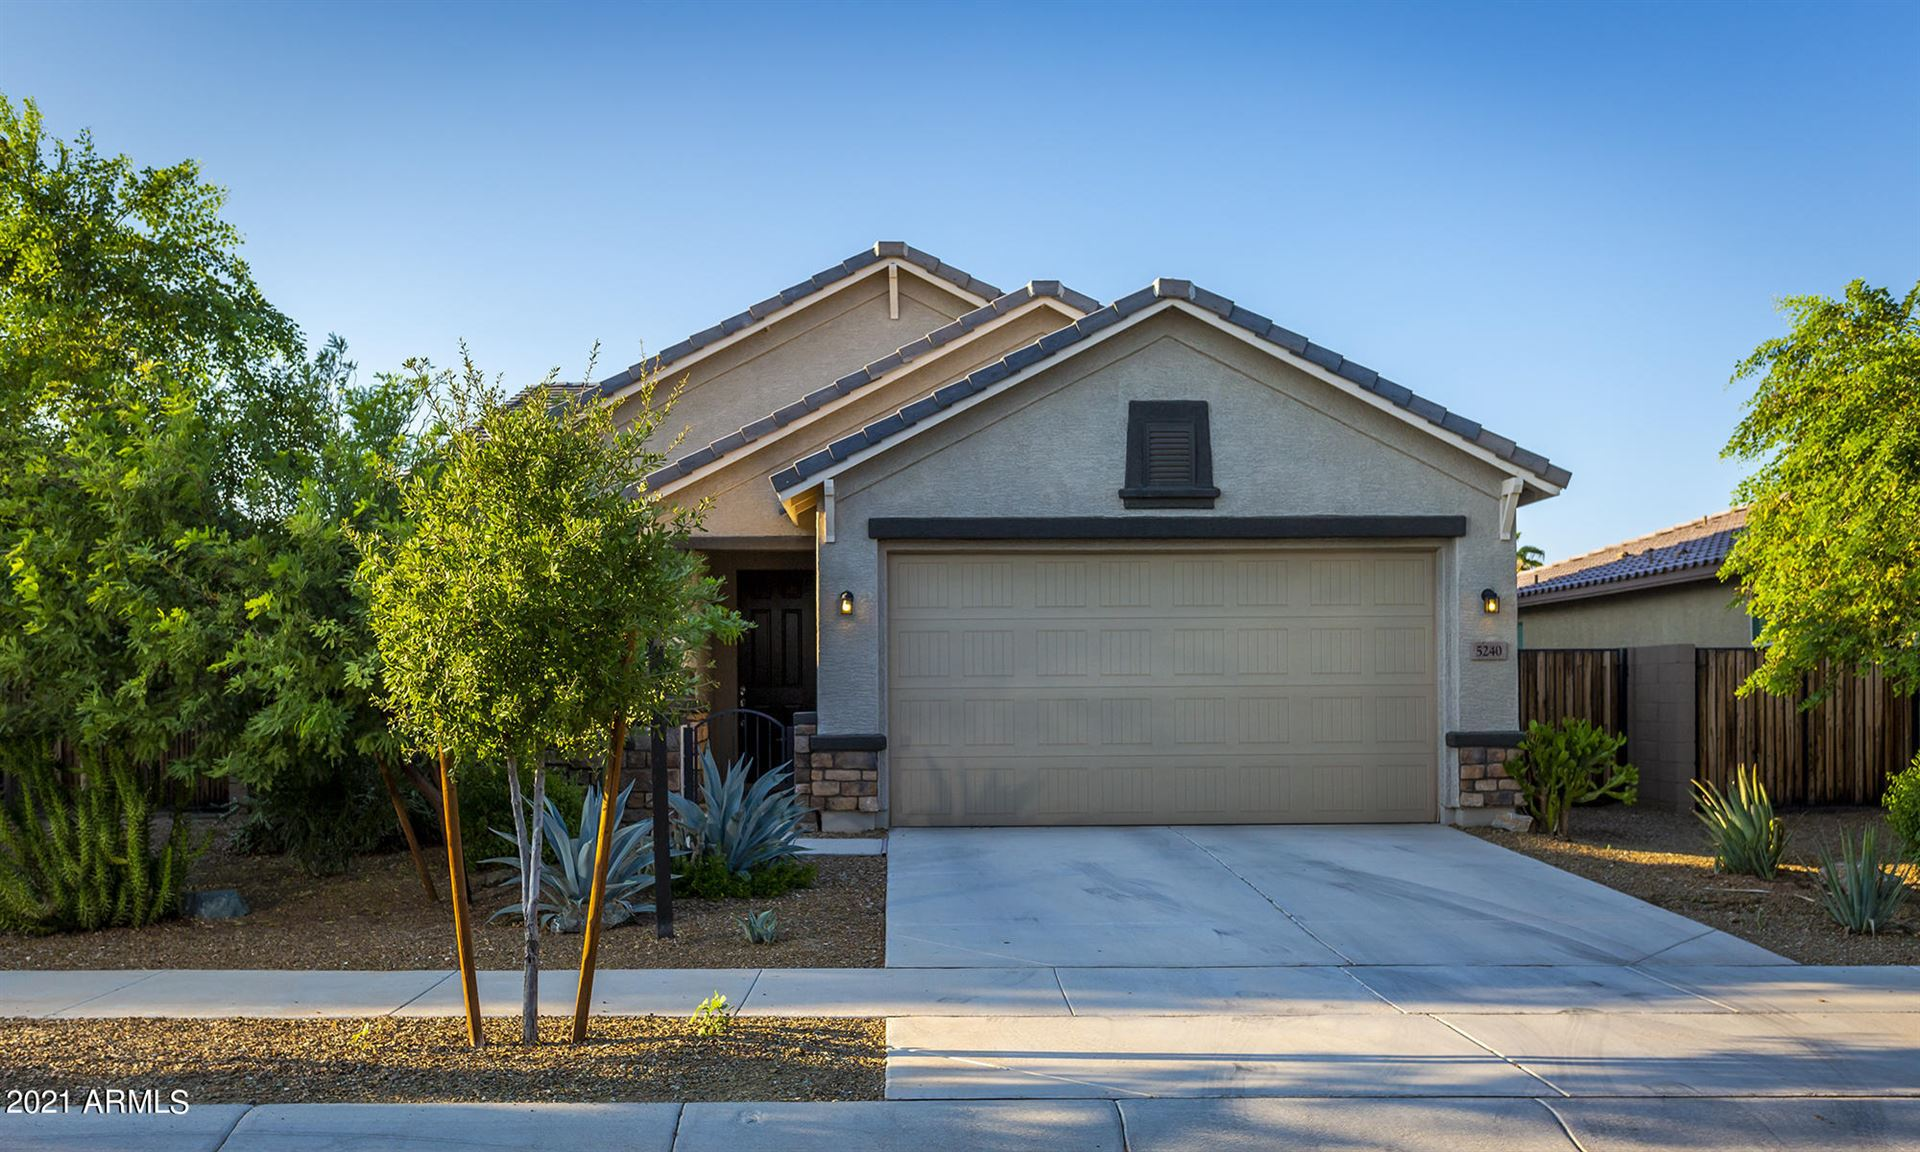 5240 W LEODRA Lane, Laveen, AZ 85339 - MLS#: 6278086